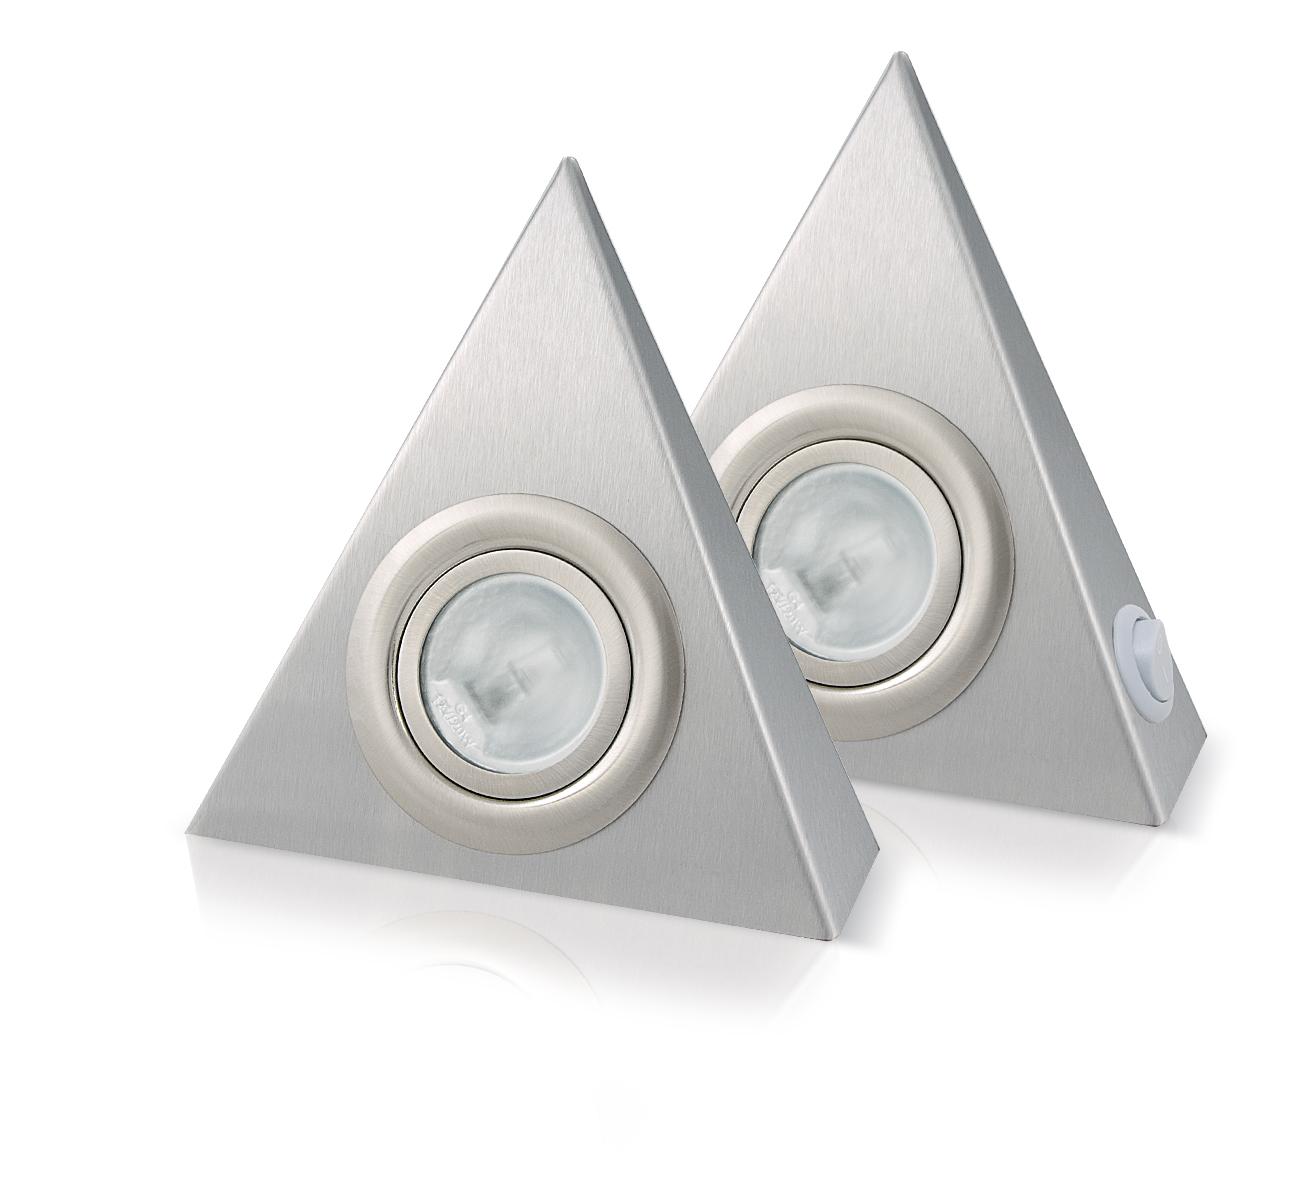 lampy podszafkowe